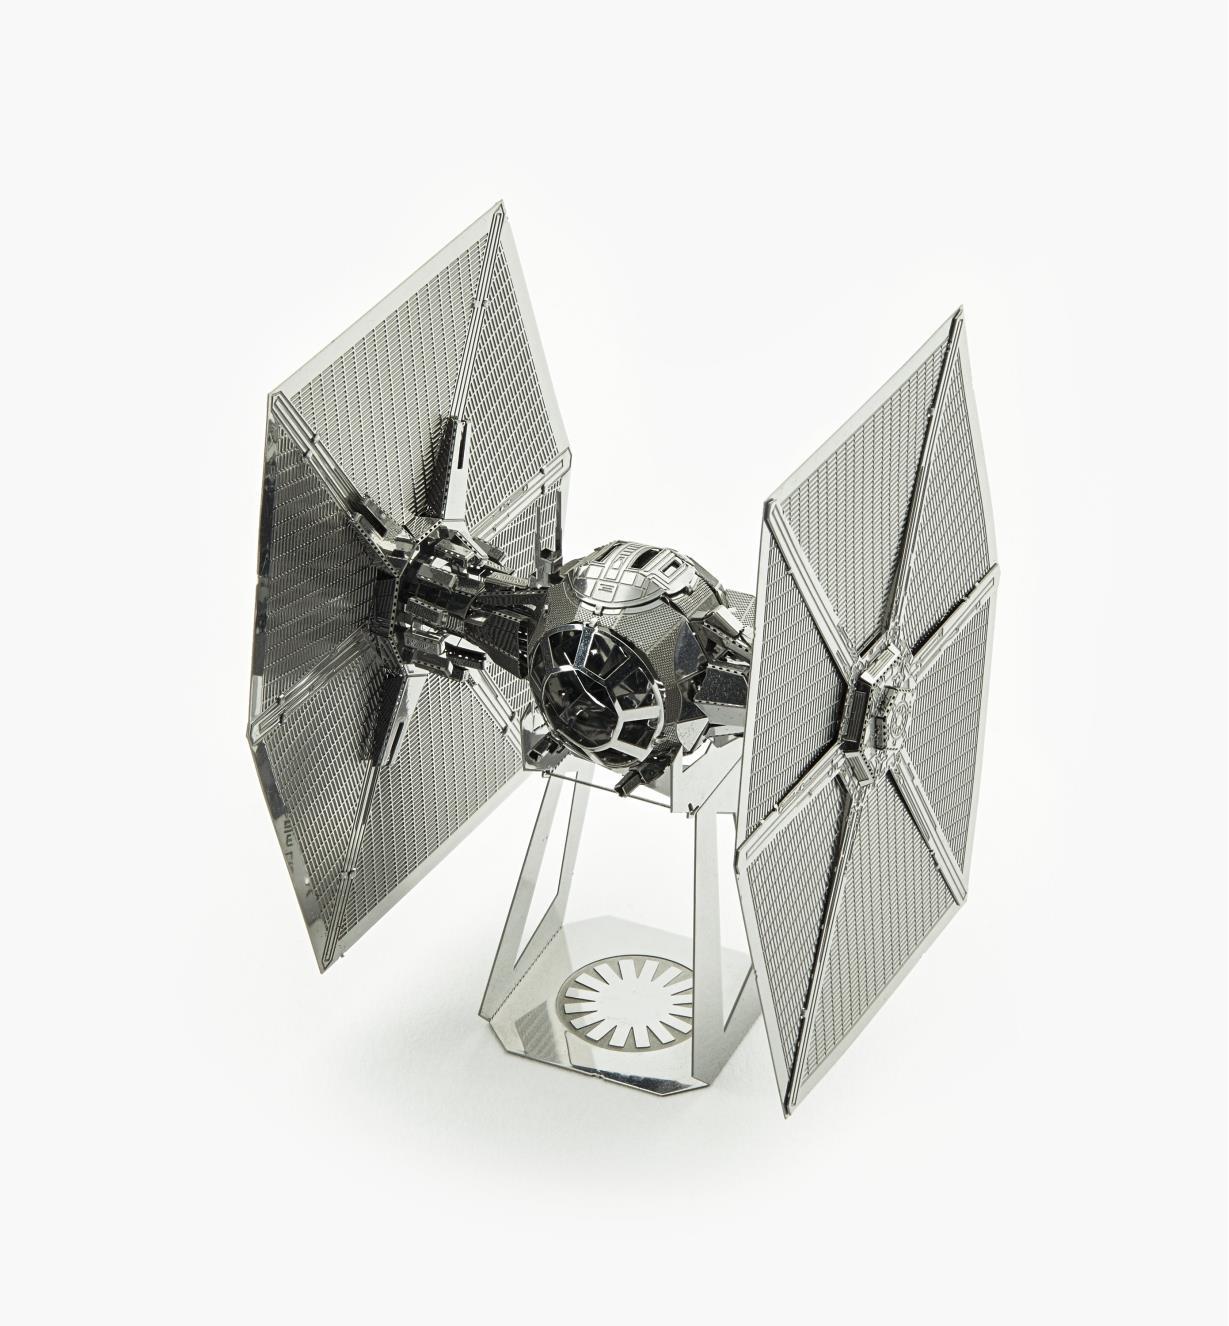 45K4121 - Star Wars: The Force Awakens Metal Model Kit -Special Forces TIE Fighter